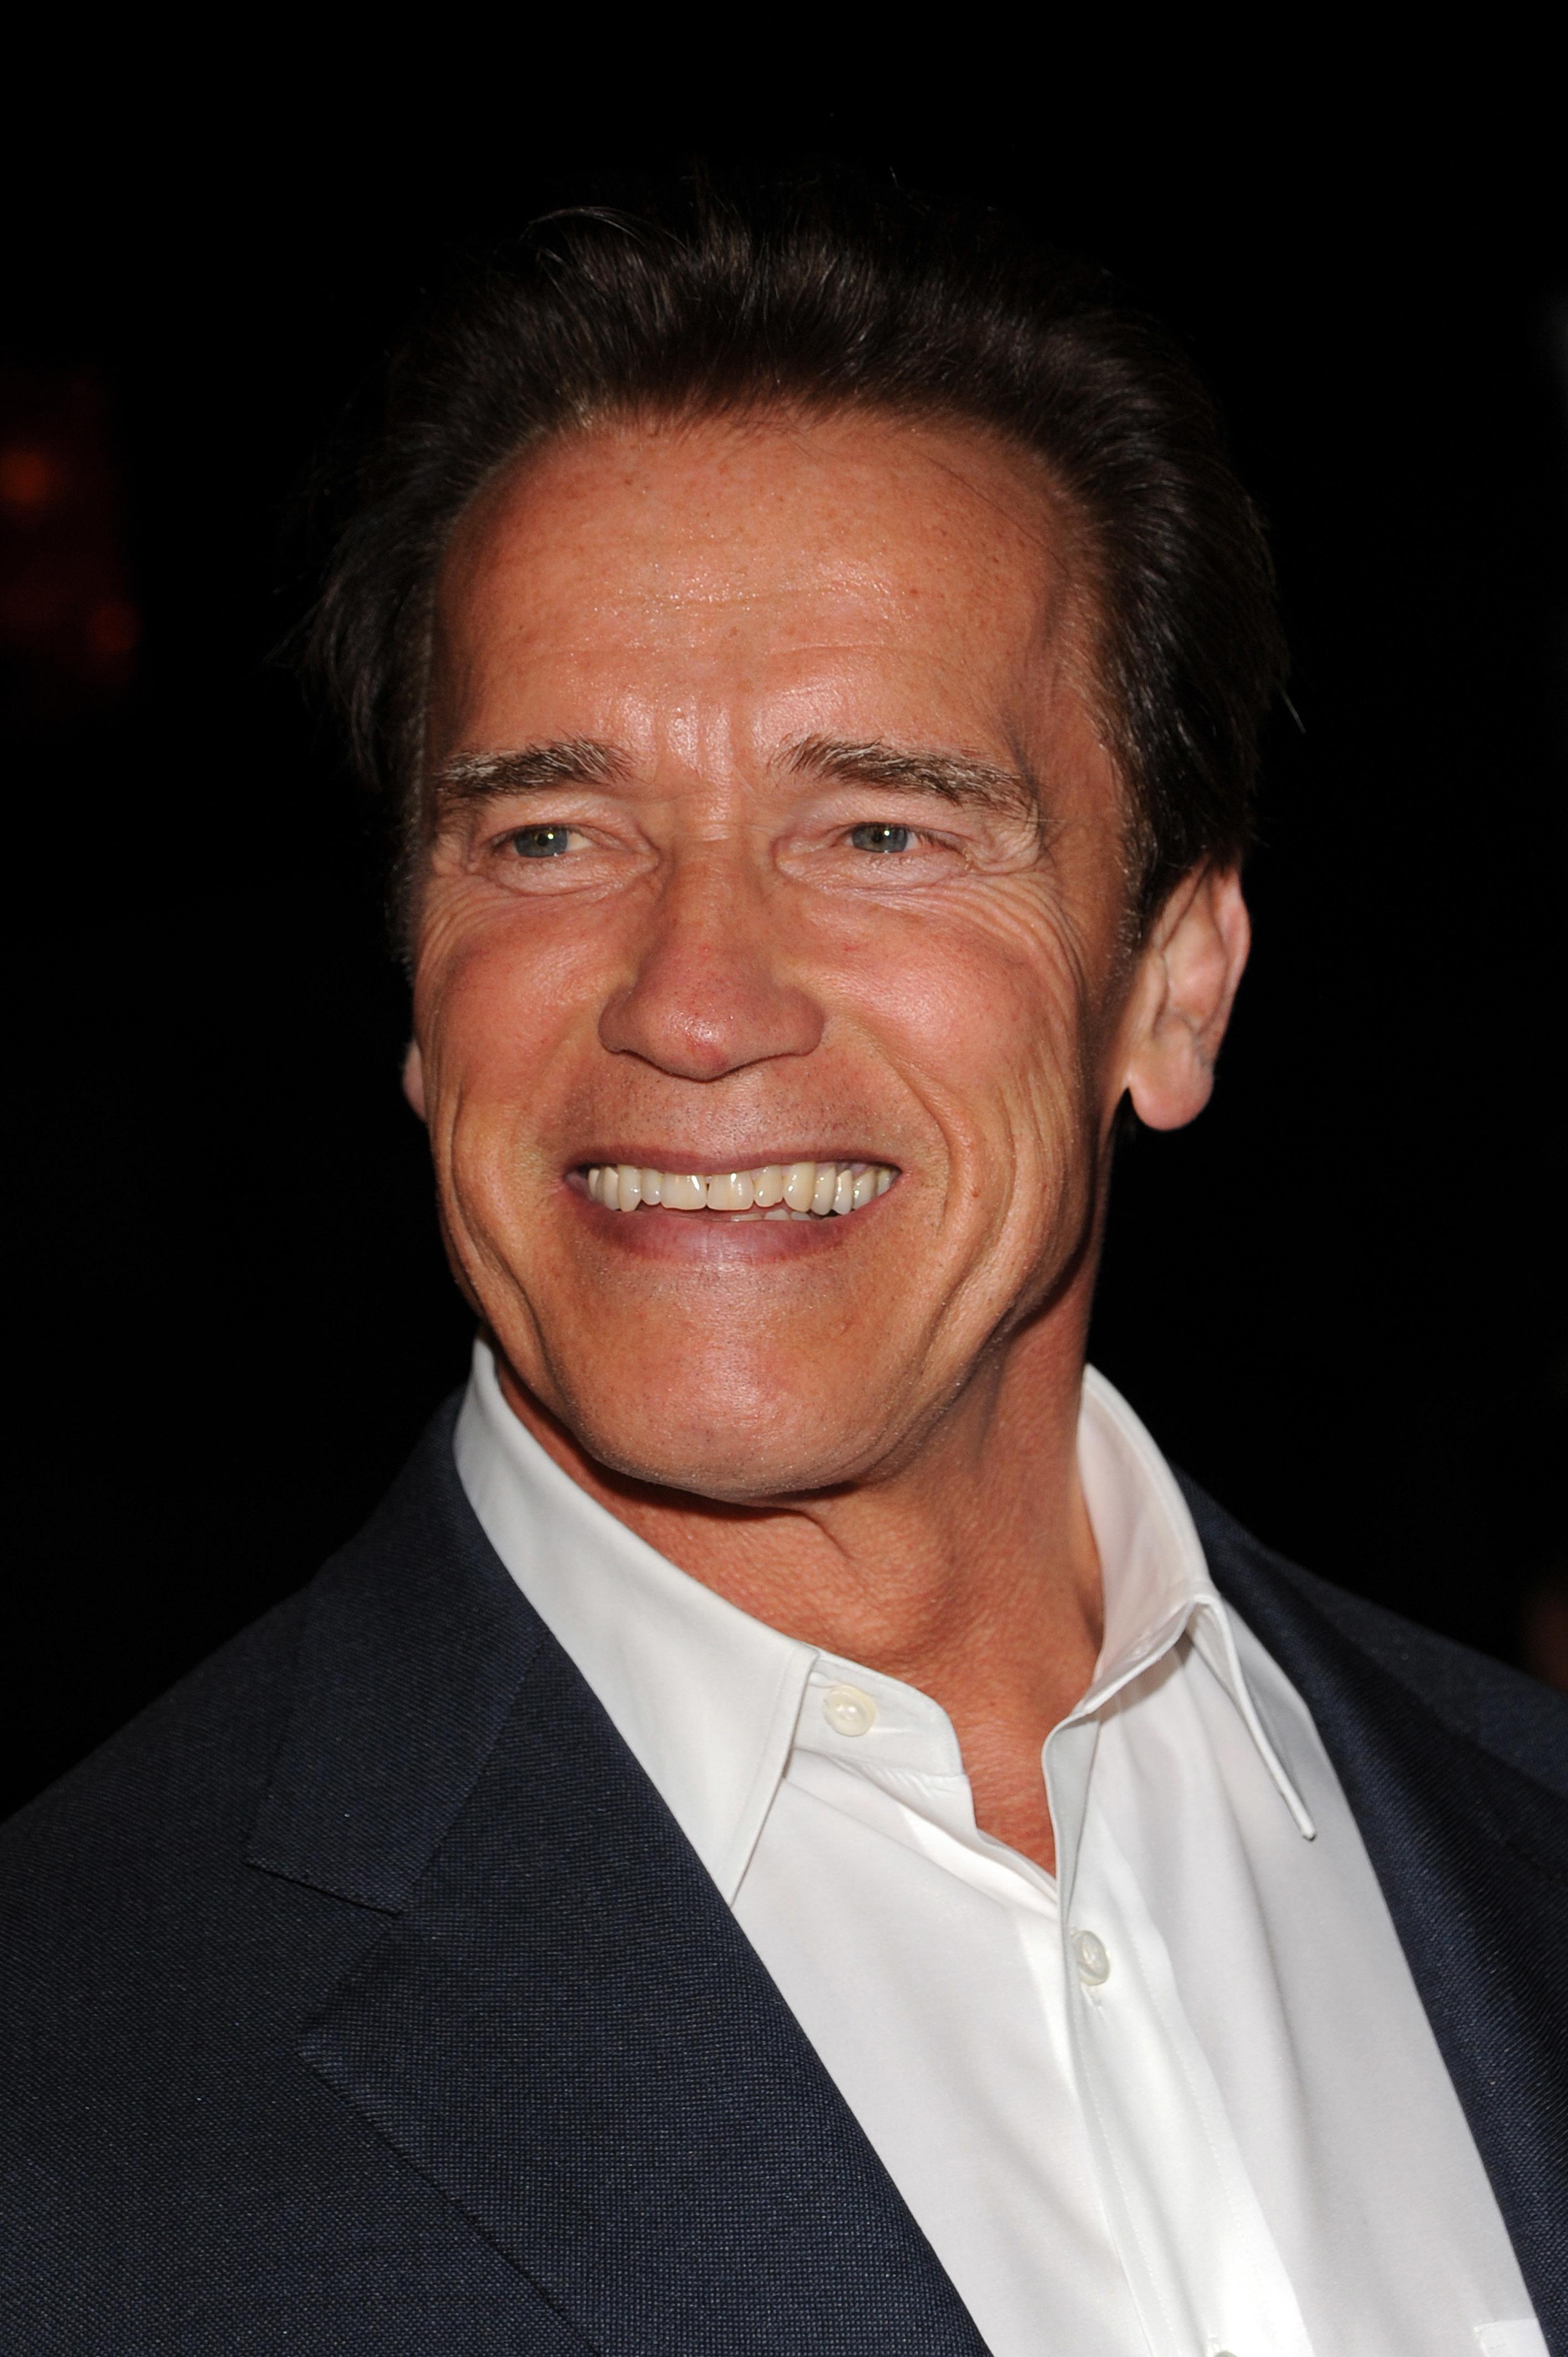 Schwarzeneg168974